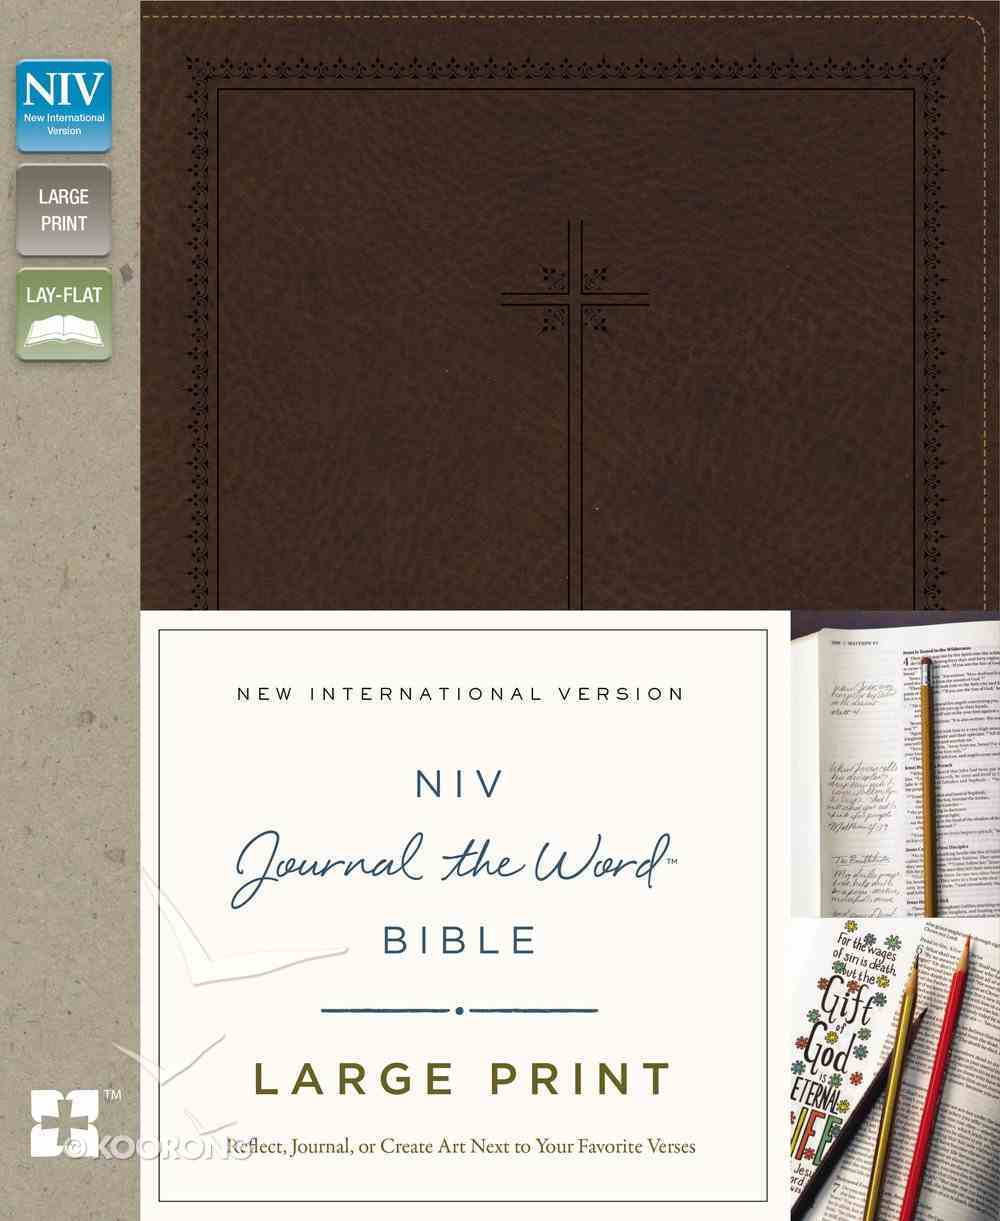 NIV Journal the Word Bible Large Print Brown (Black Letter Edition) Premium Imitation Leather